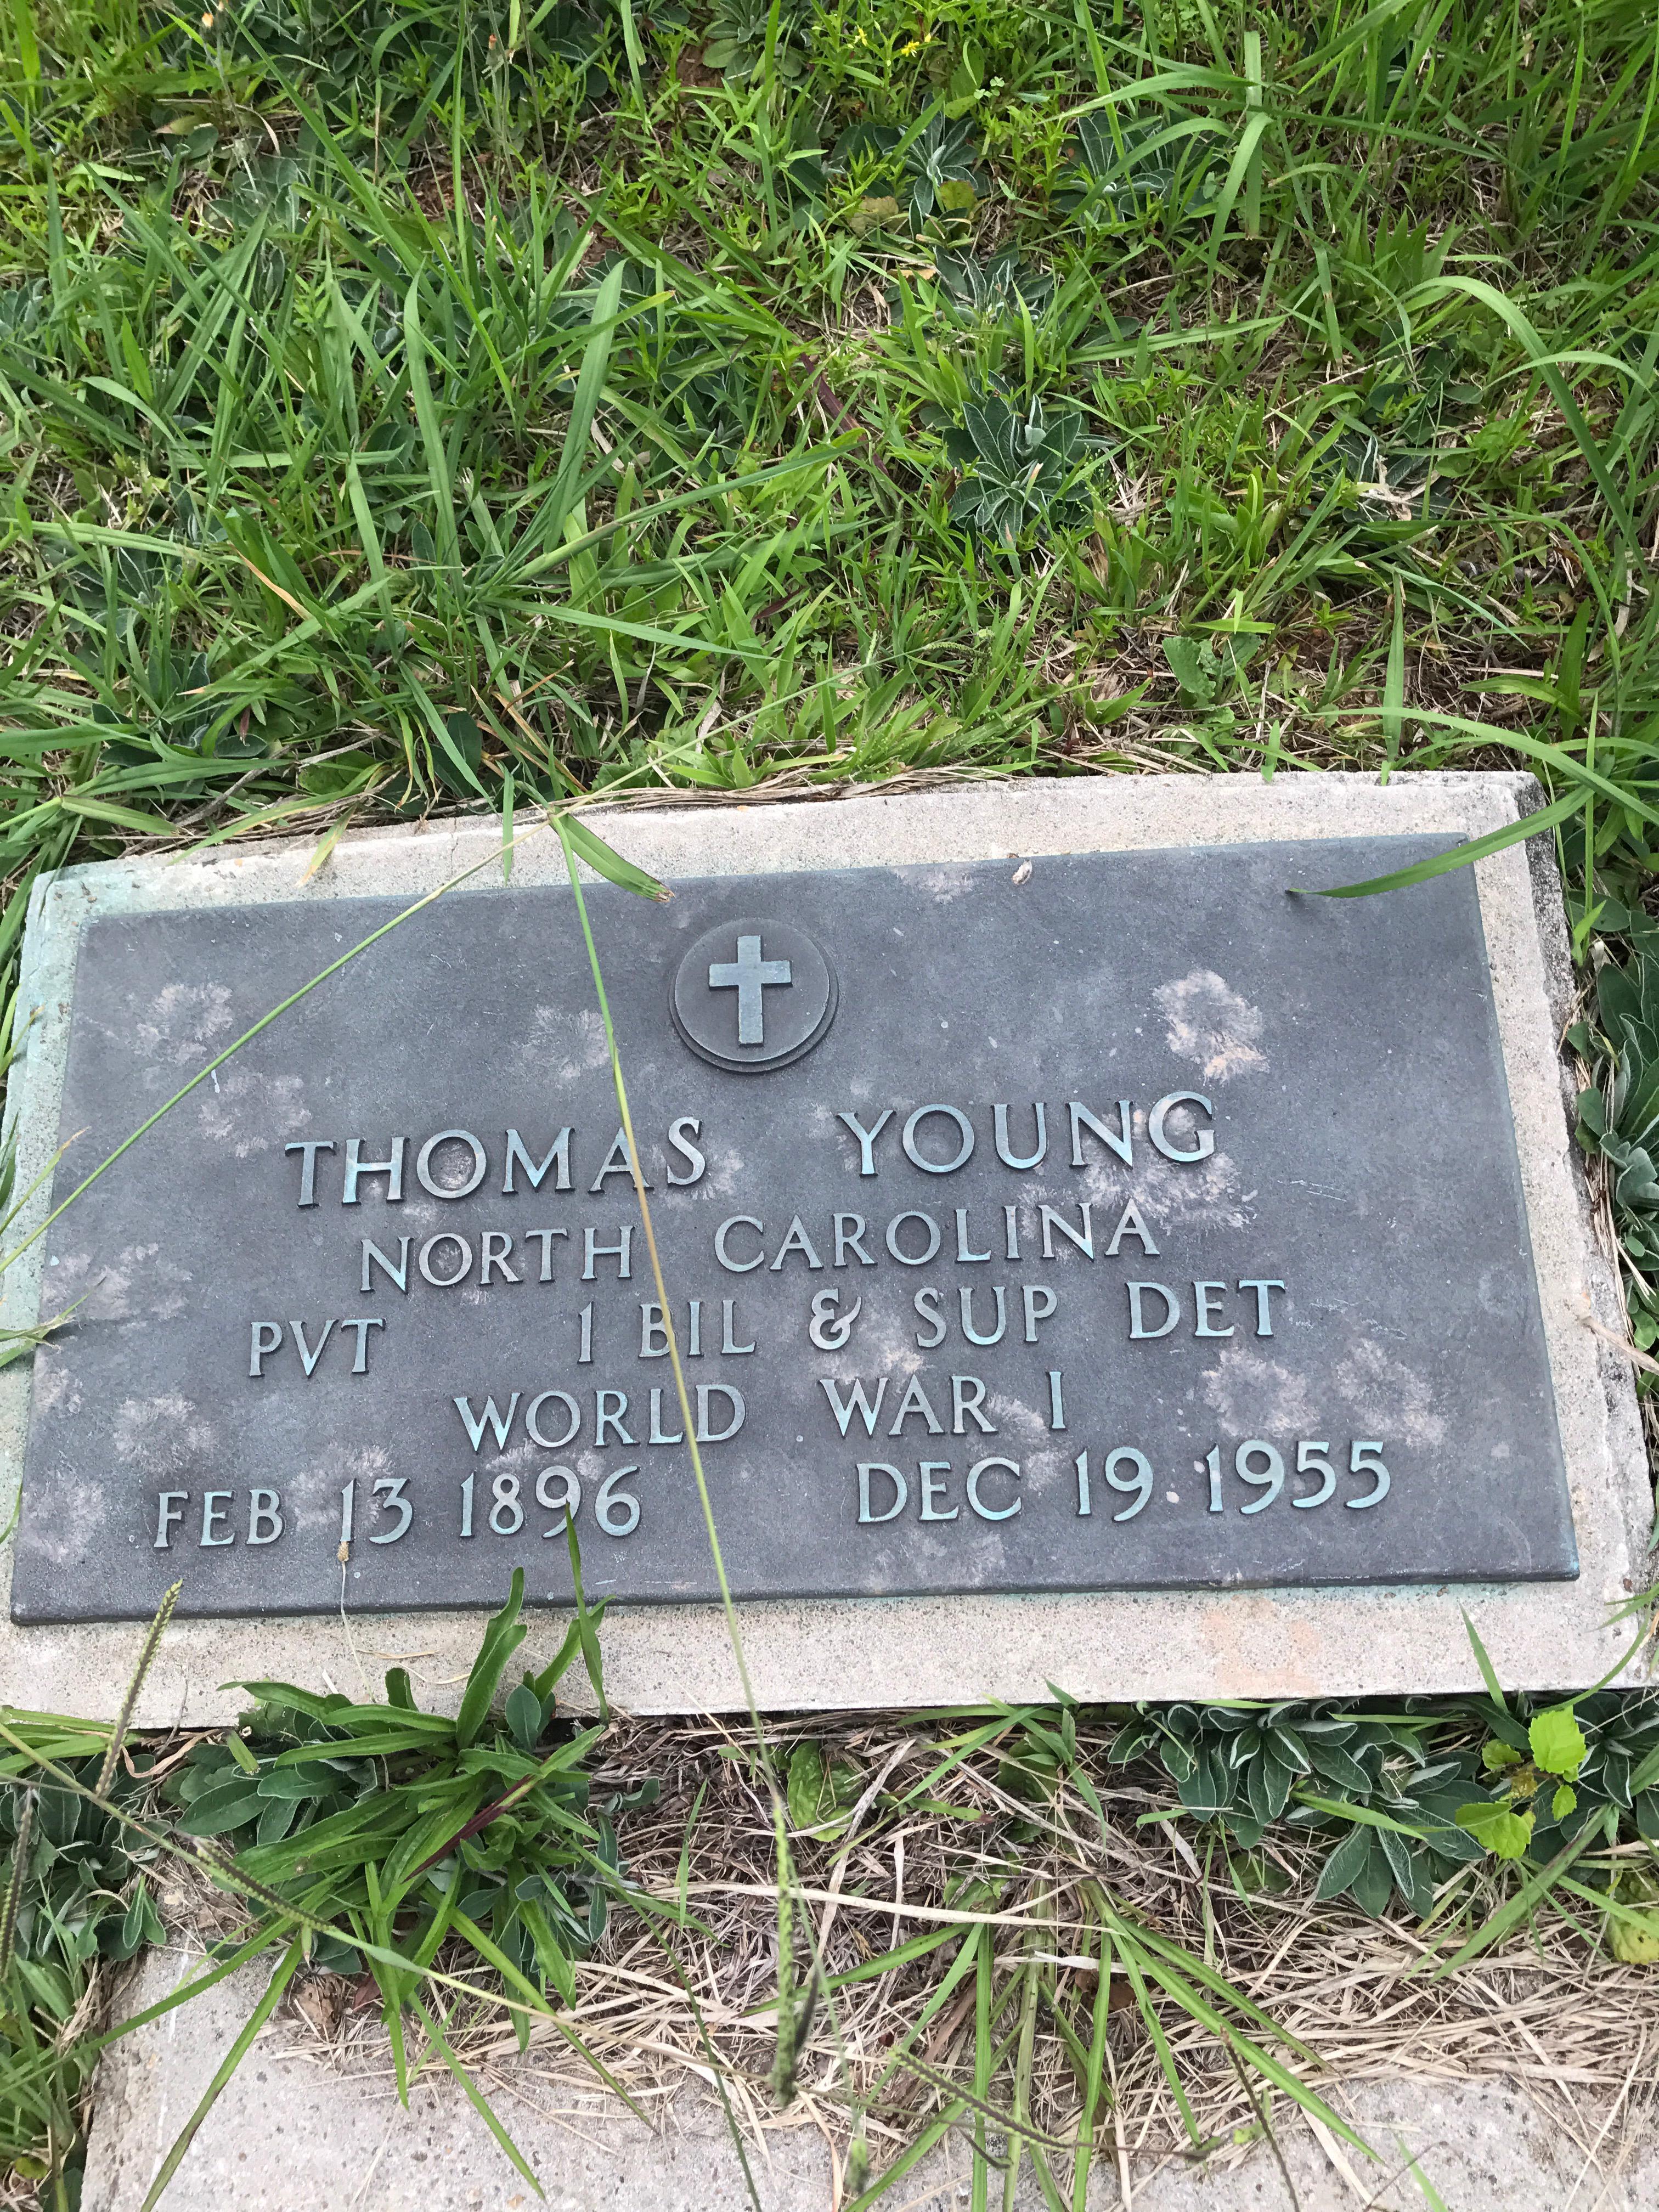 PVT Thomas C. Young